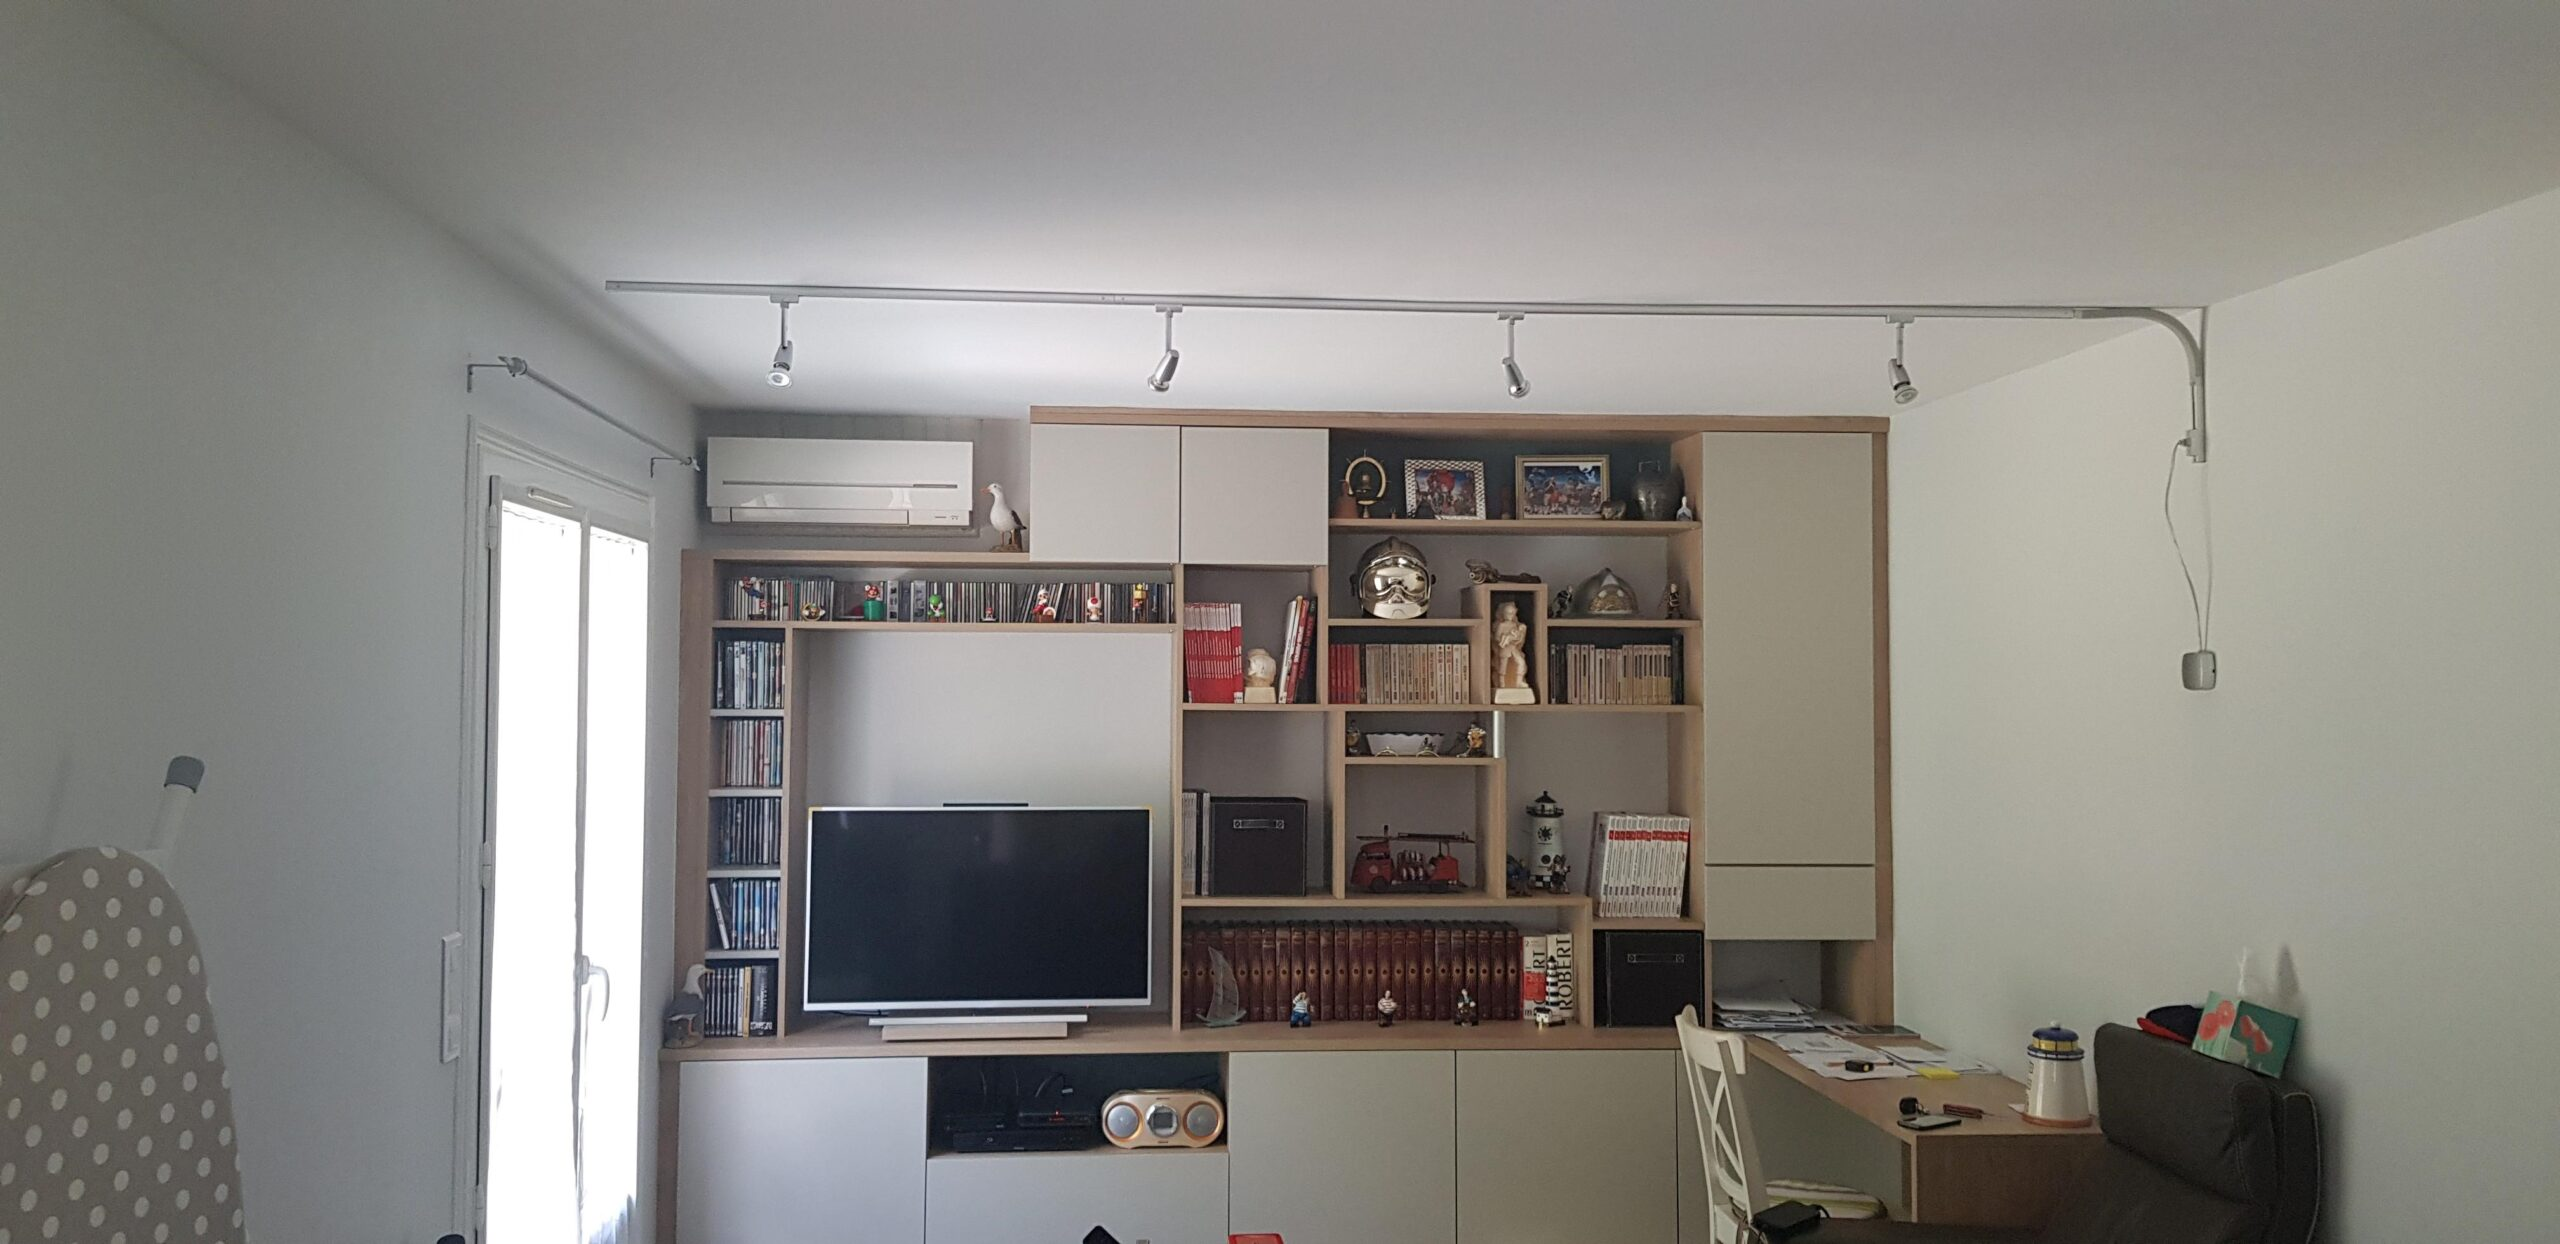 Collard bibliothèque sur mesure